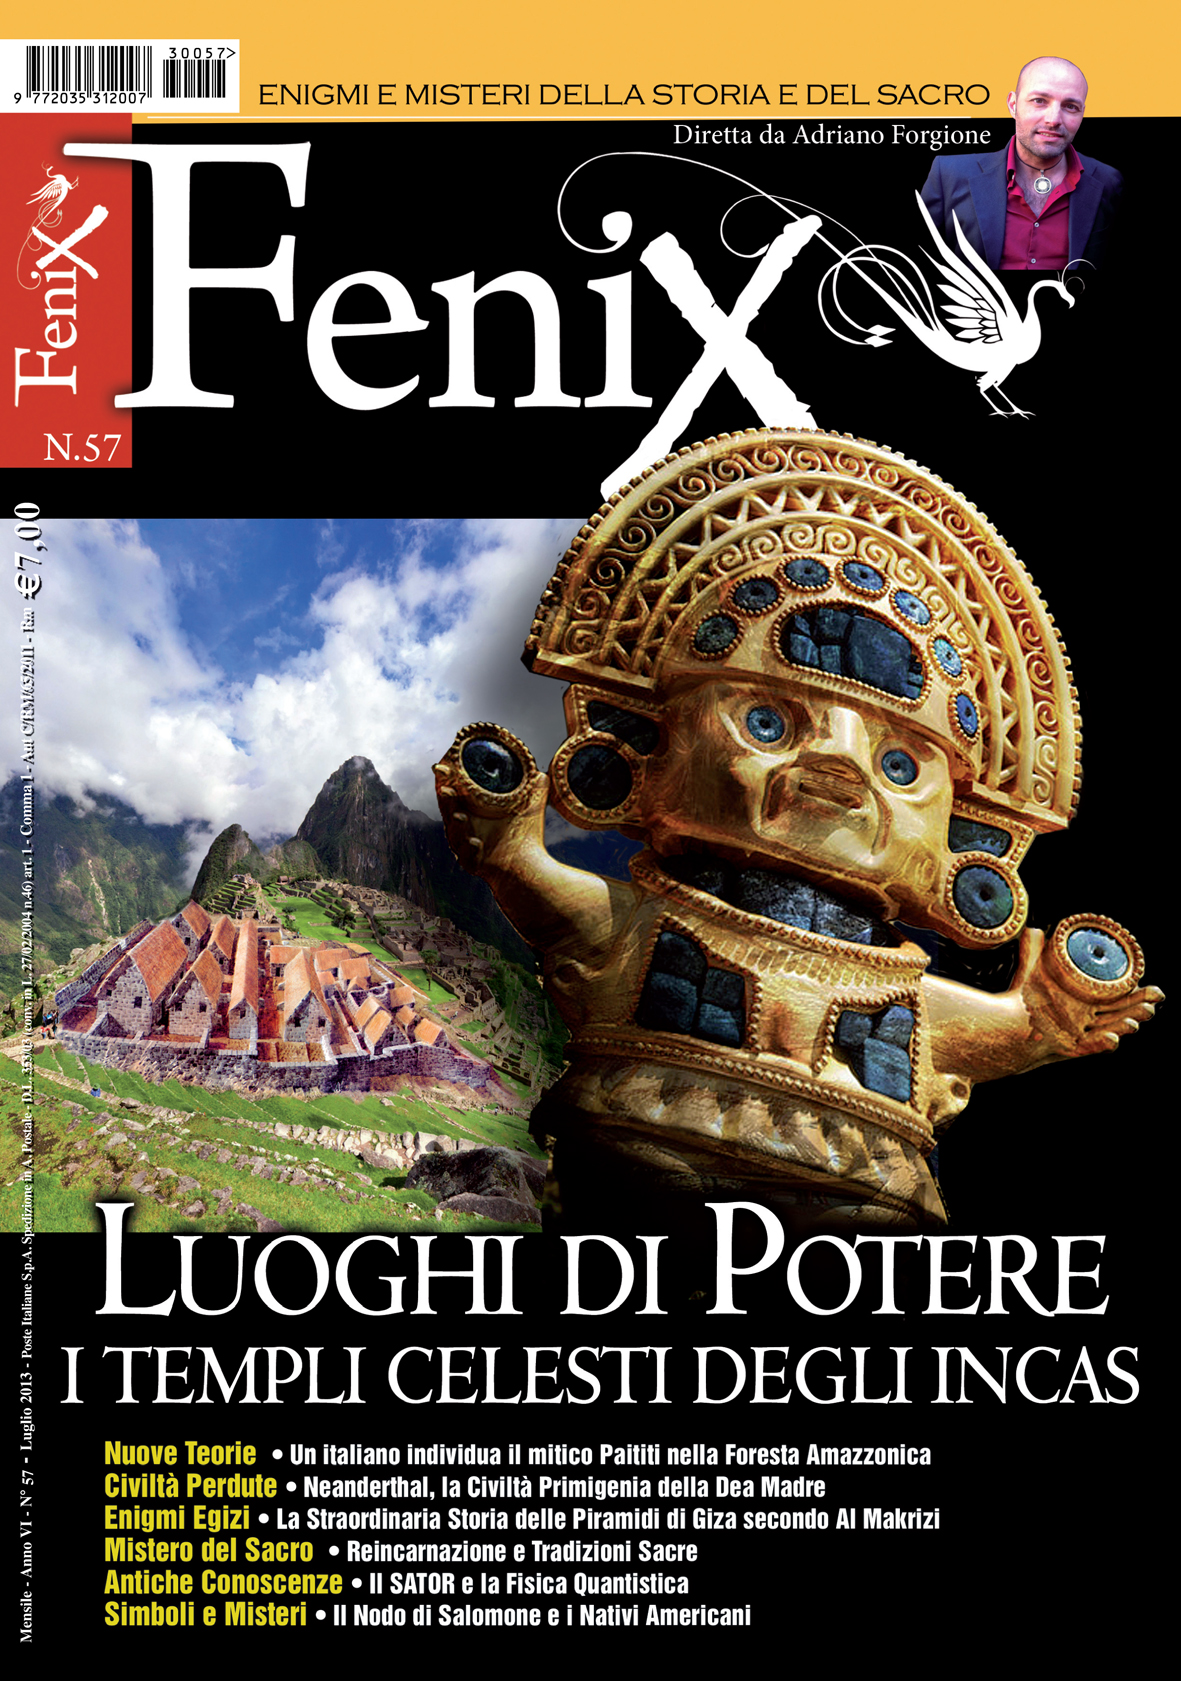 01 - 100 copertina fenix 57_01 - copertina X-Times1